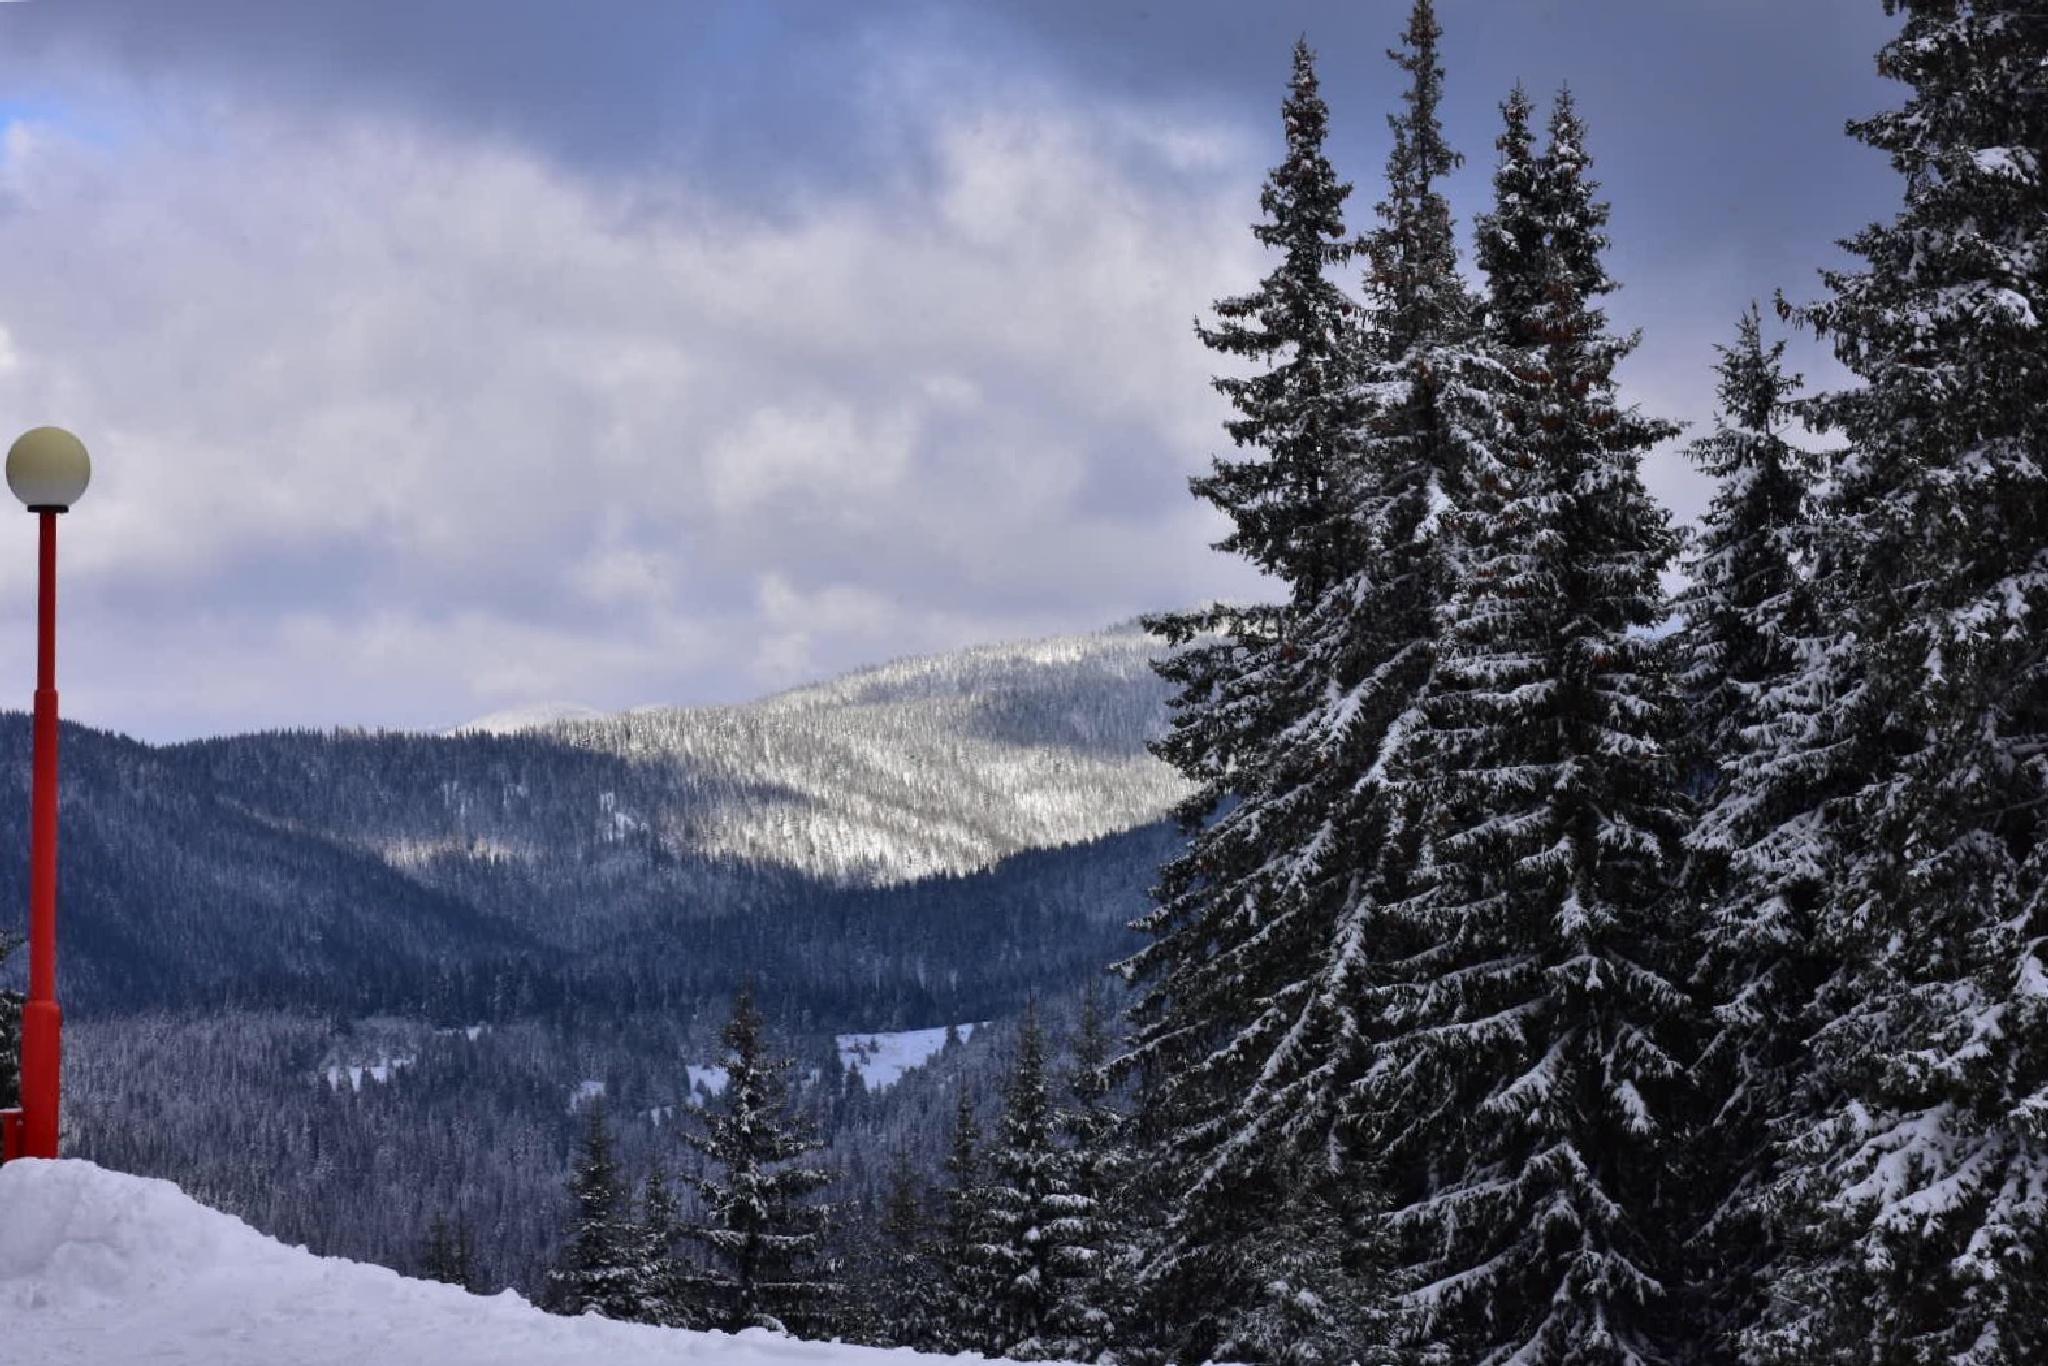 View 2 by Bistra Belcheva